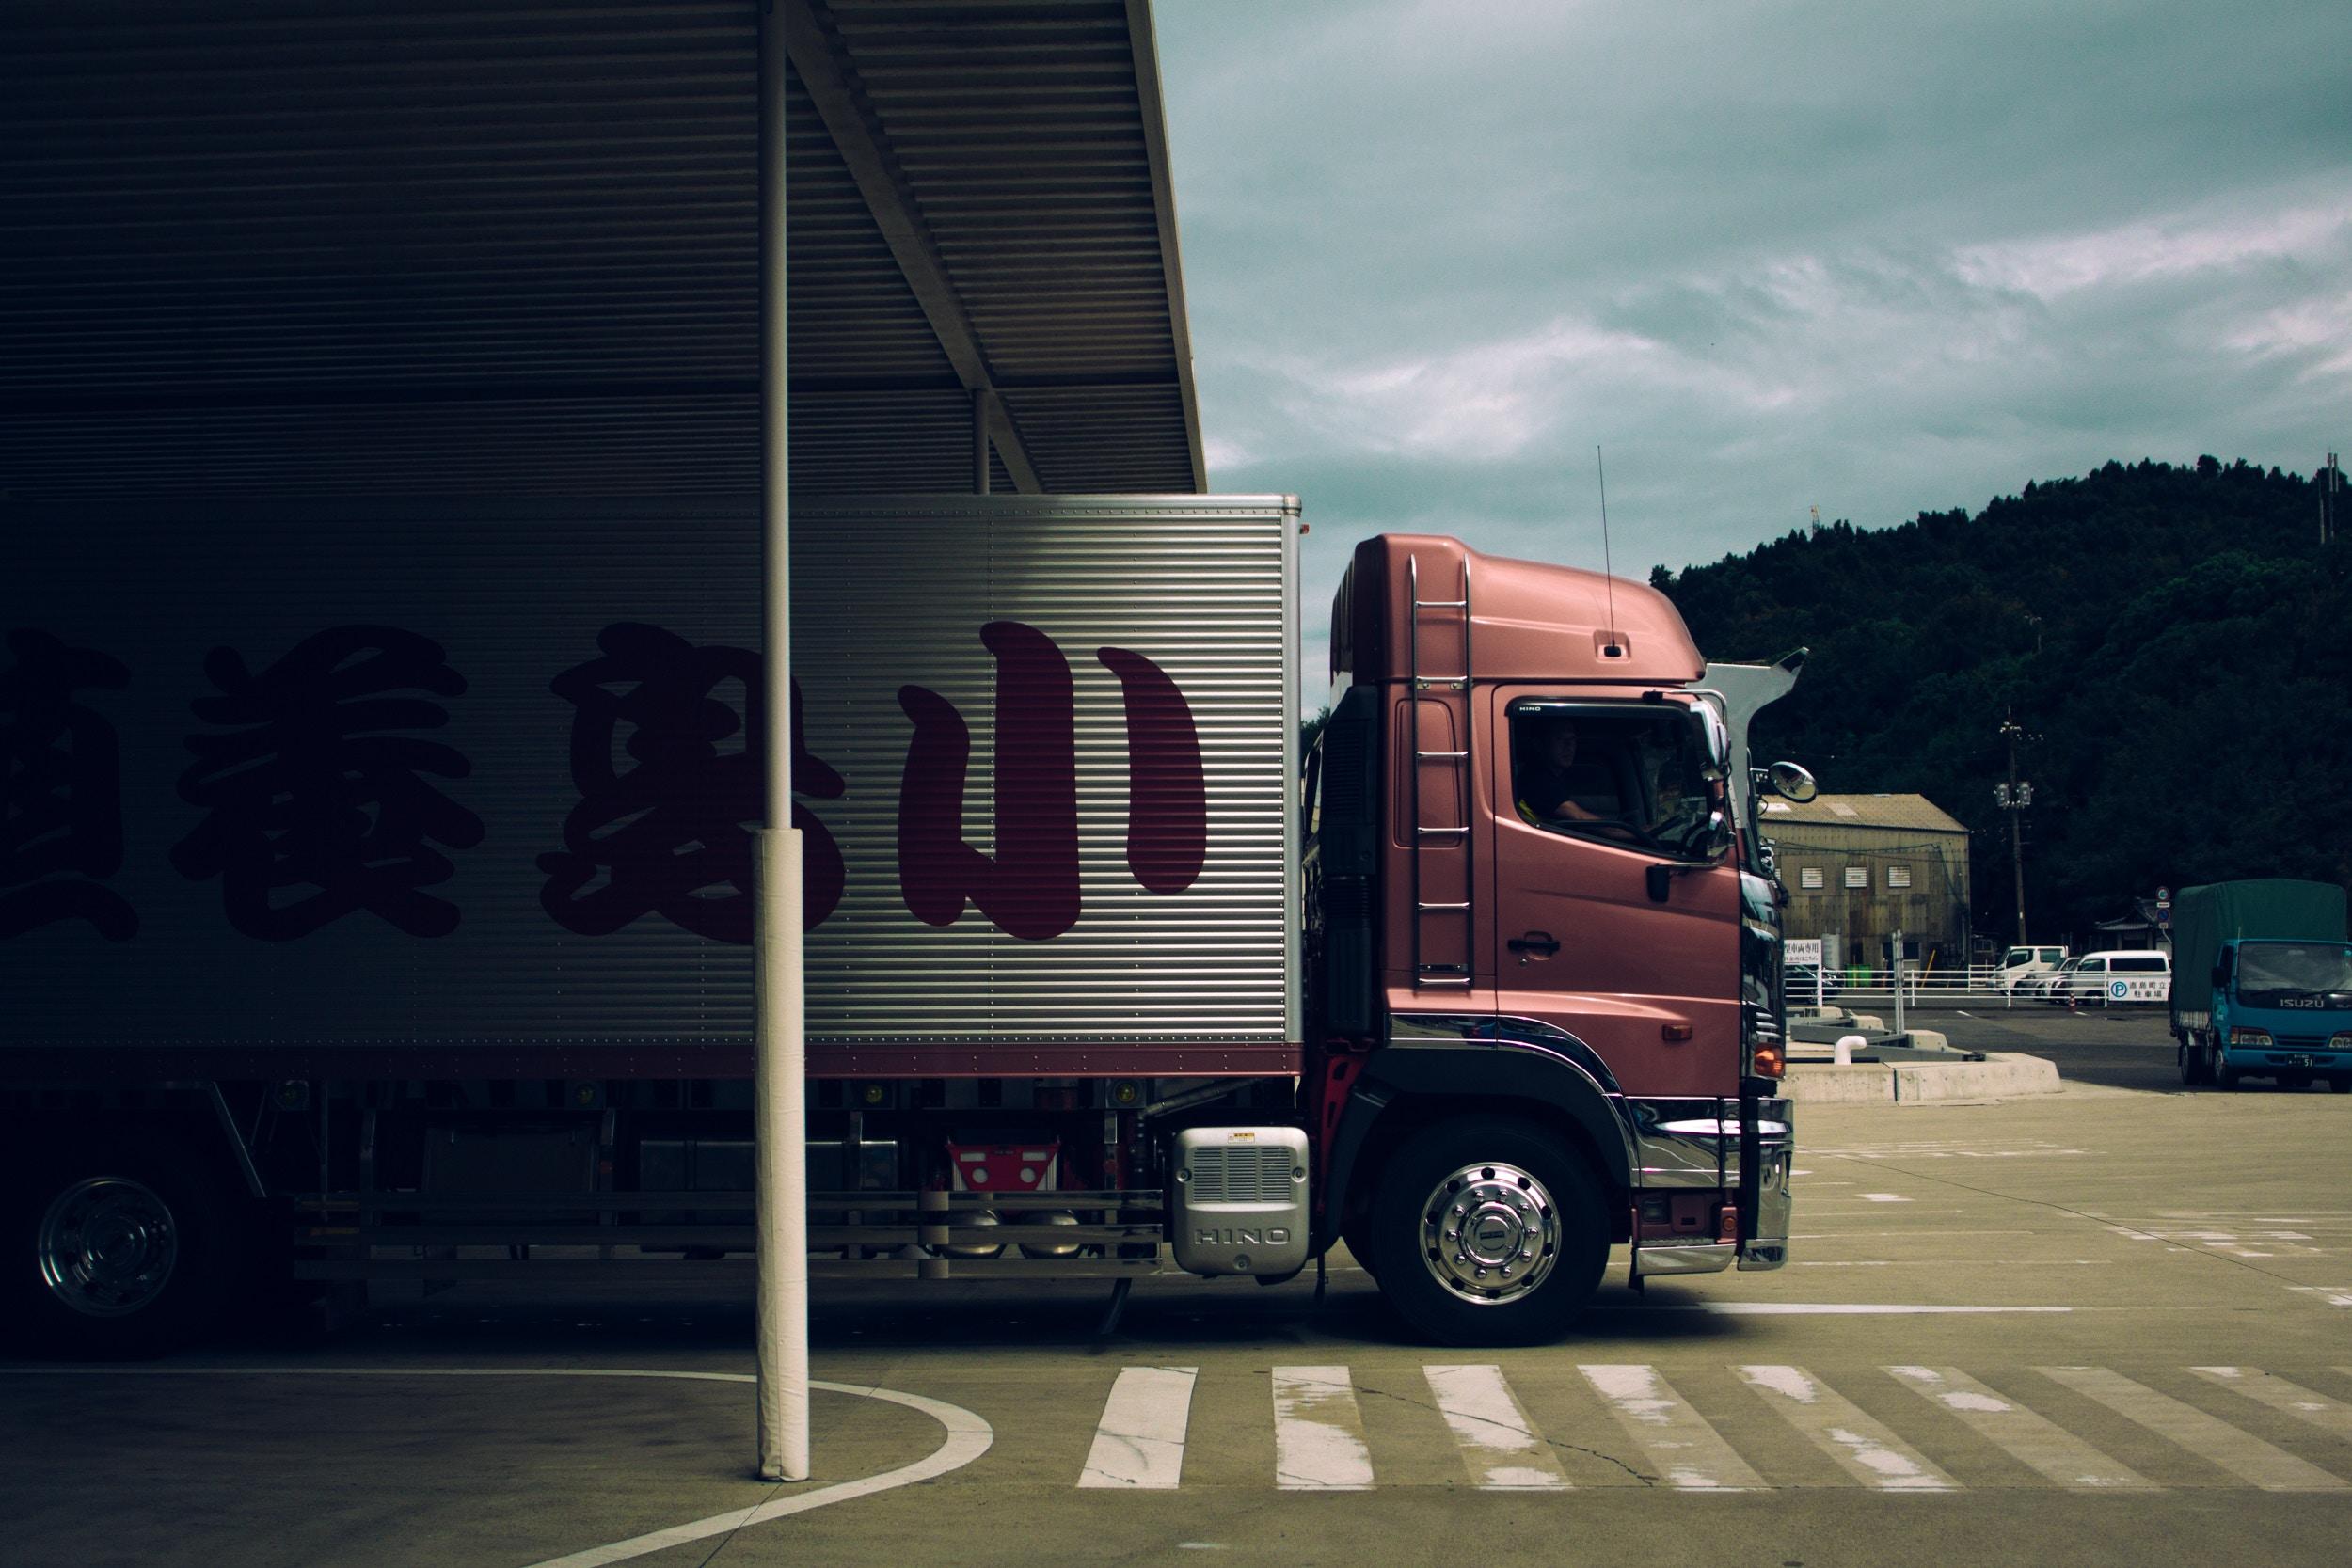 Japanese Semi Truck